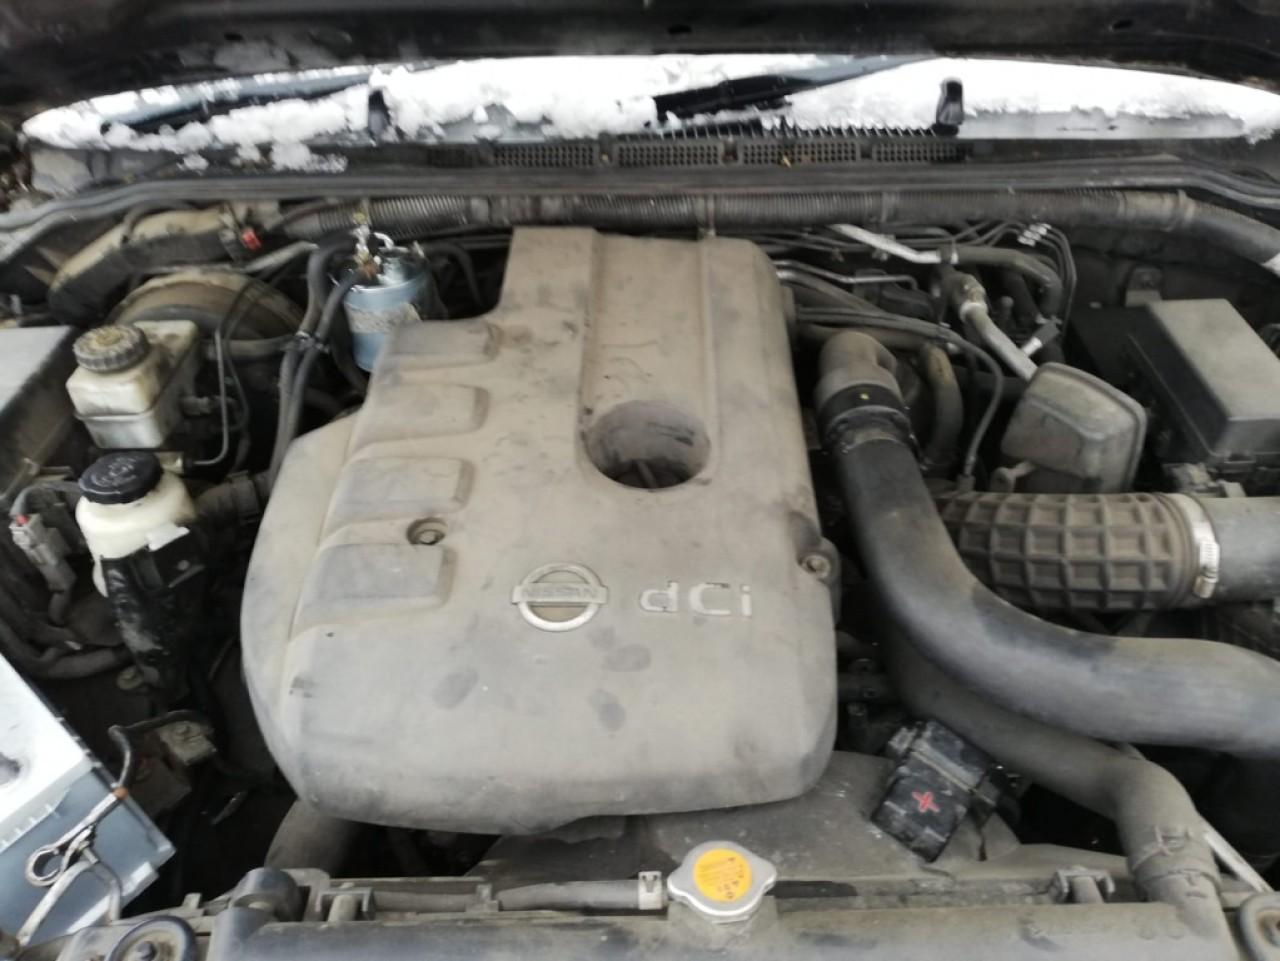 Nissan NAVARA 2006 Pick-up 2.5DCI